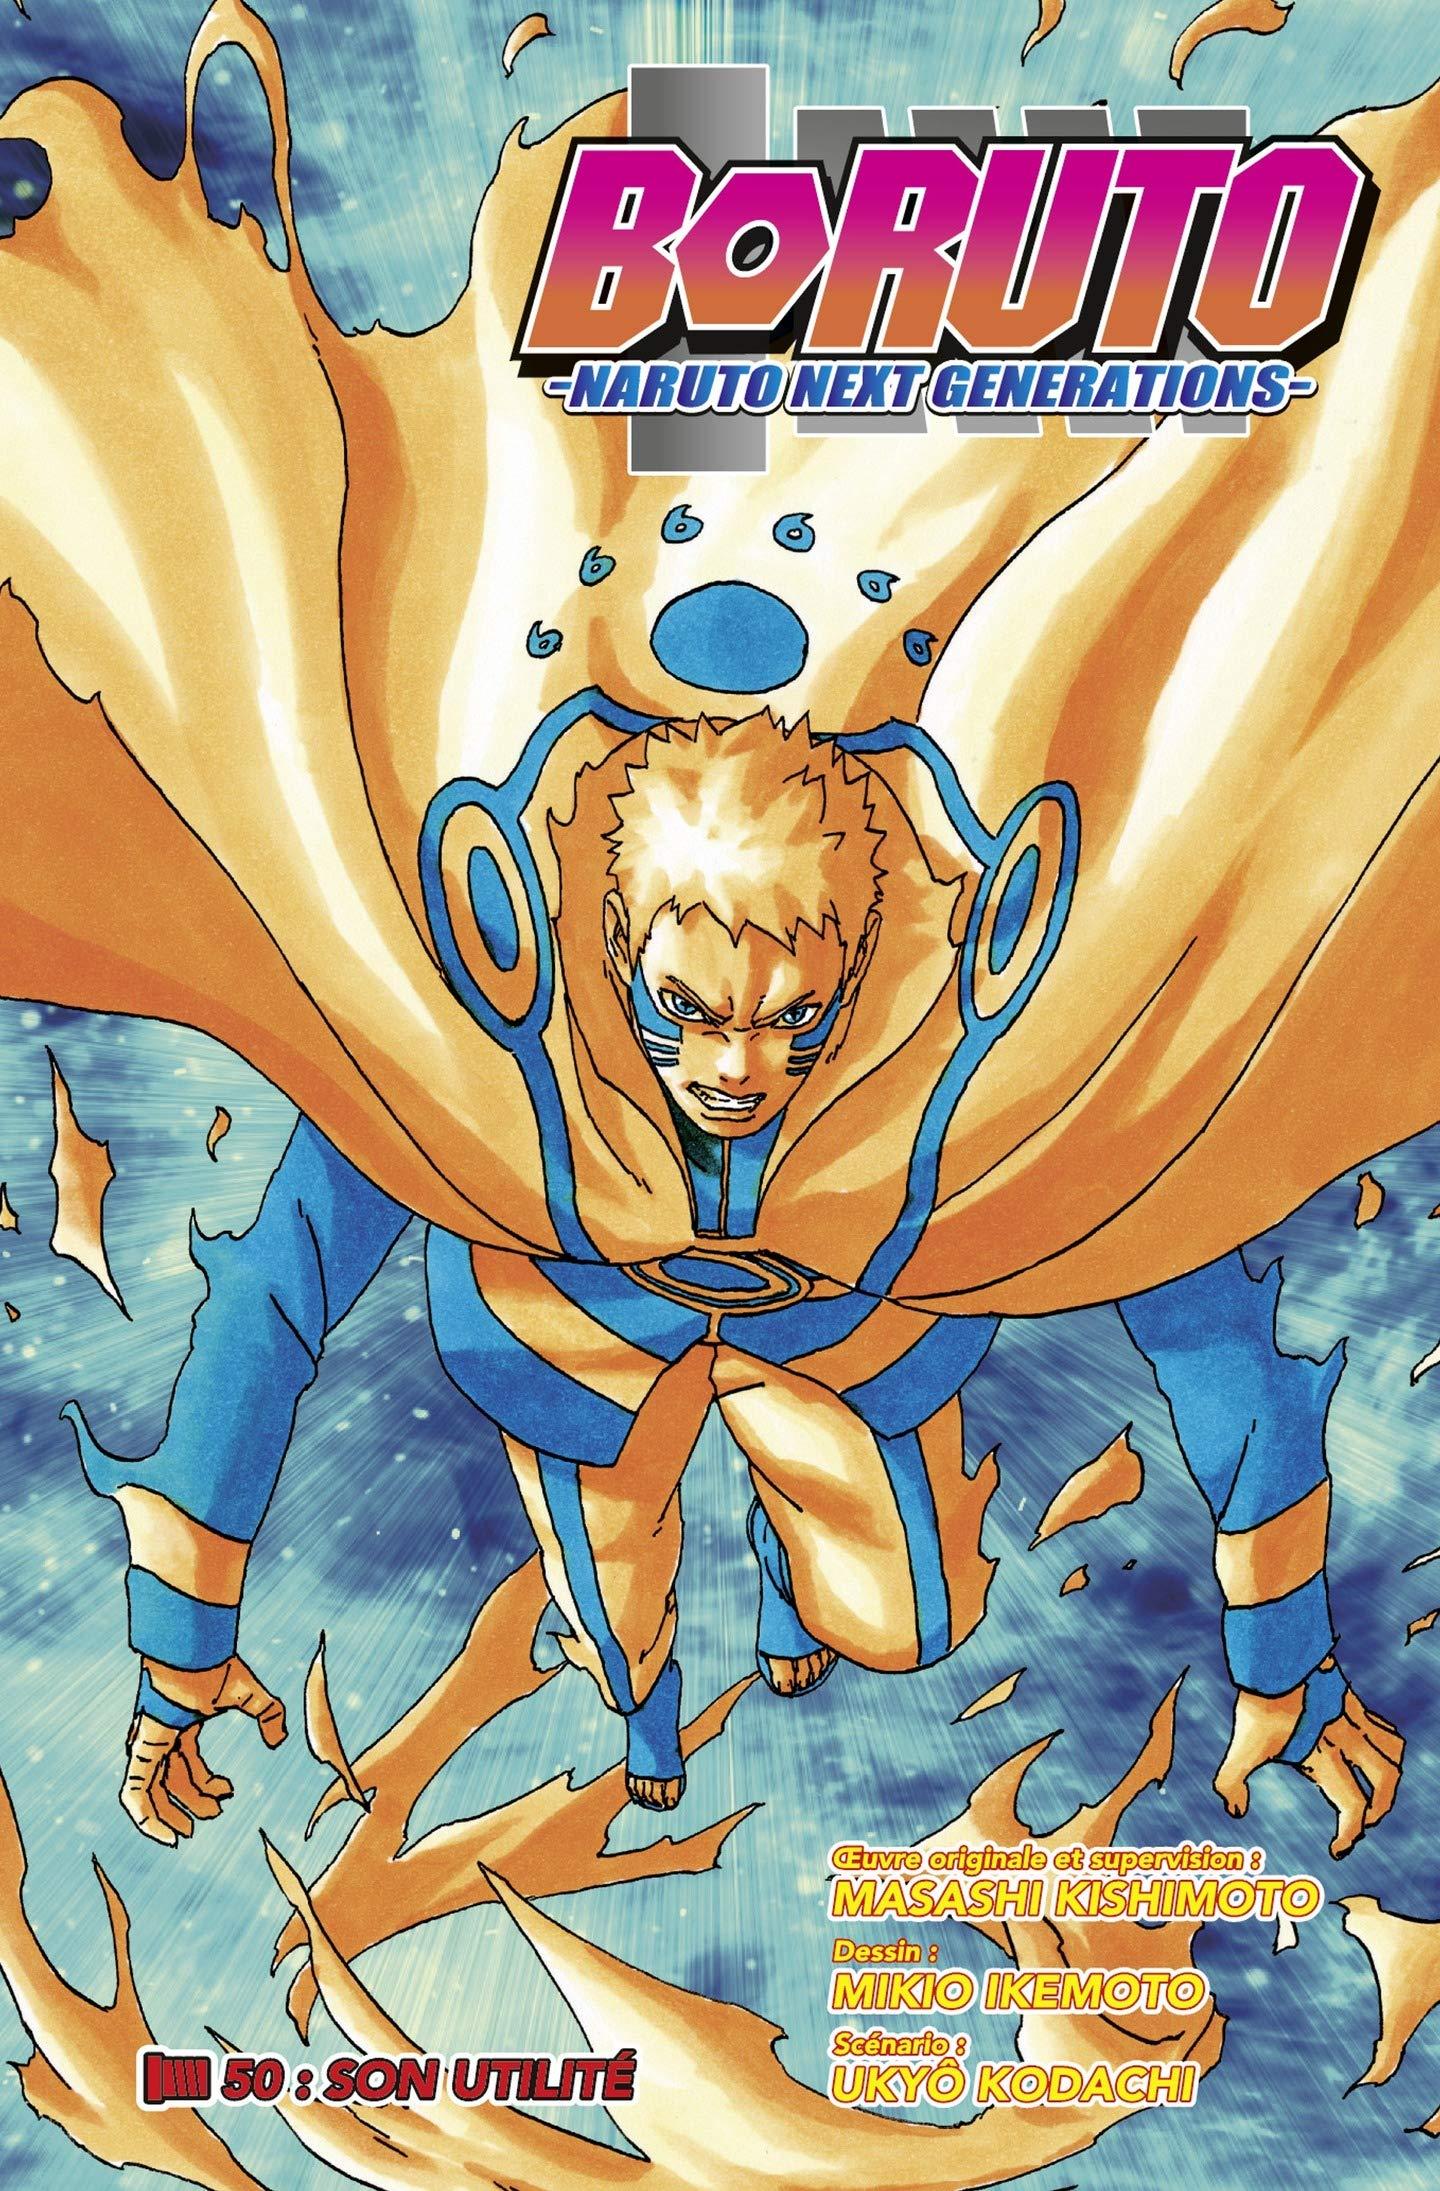 Boruto - Naruto next generations - Chapitre 50: Son utilité